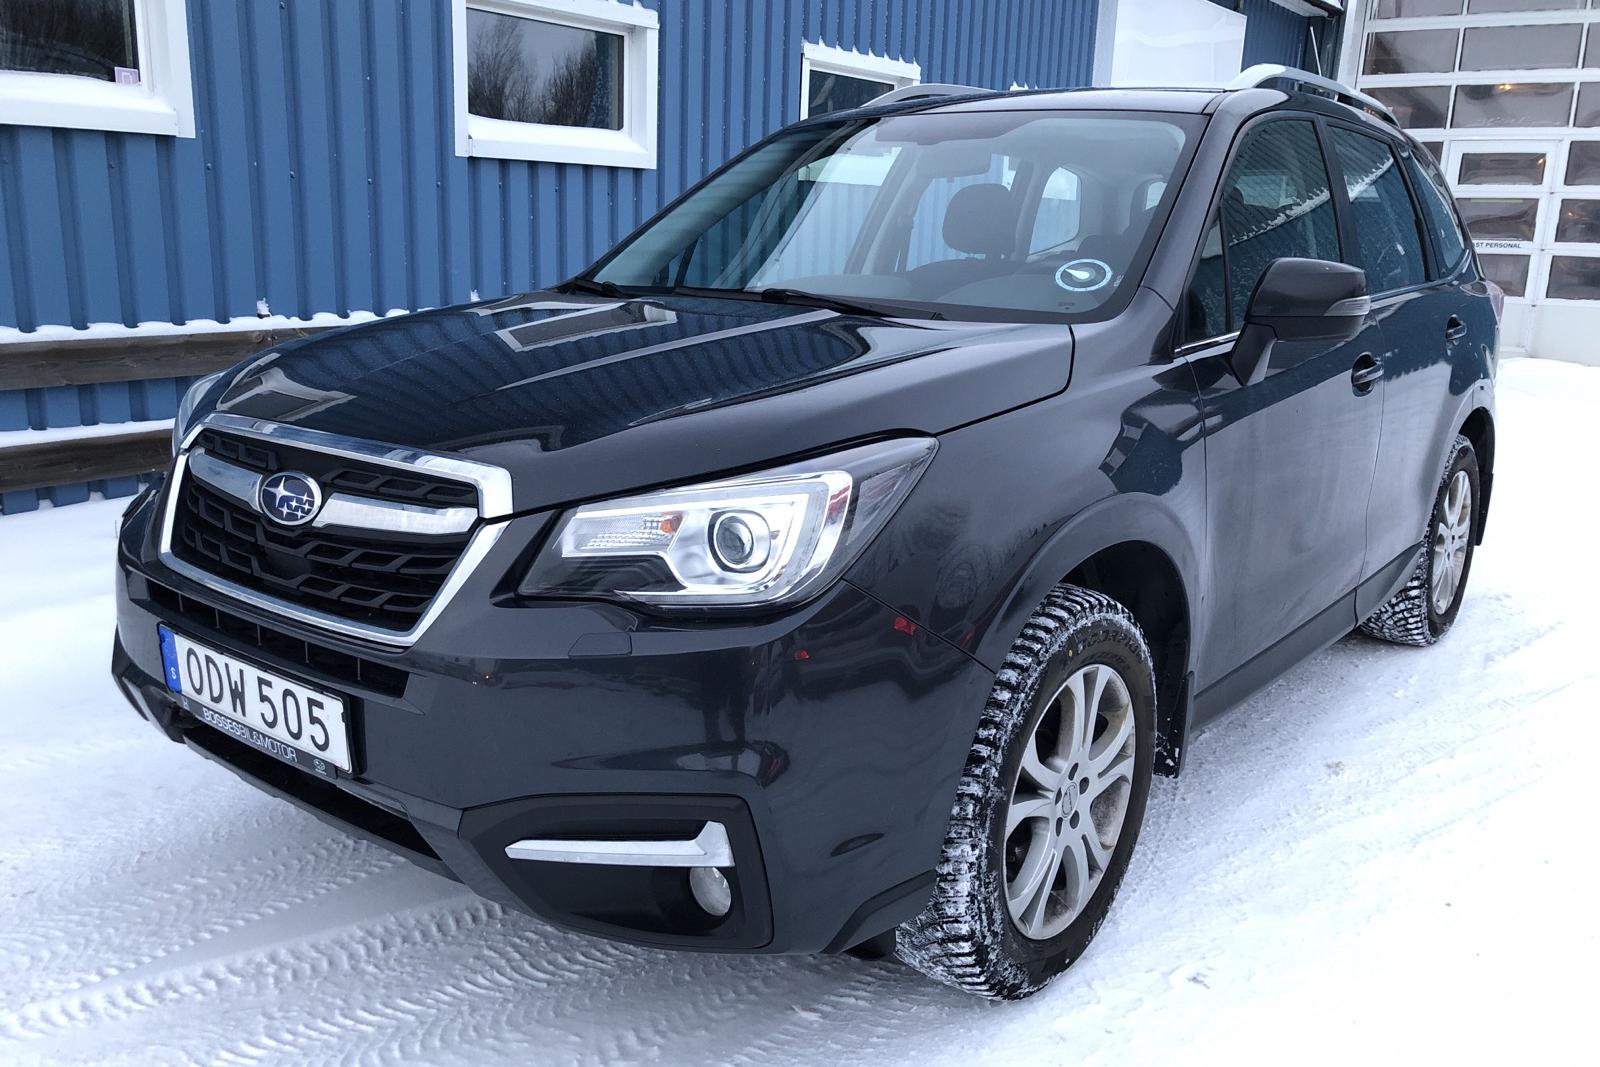 Subaru Forester 2.0D (147hk) - 89 190 km - Automatic - Dark Grey - 2016